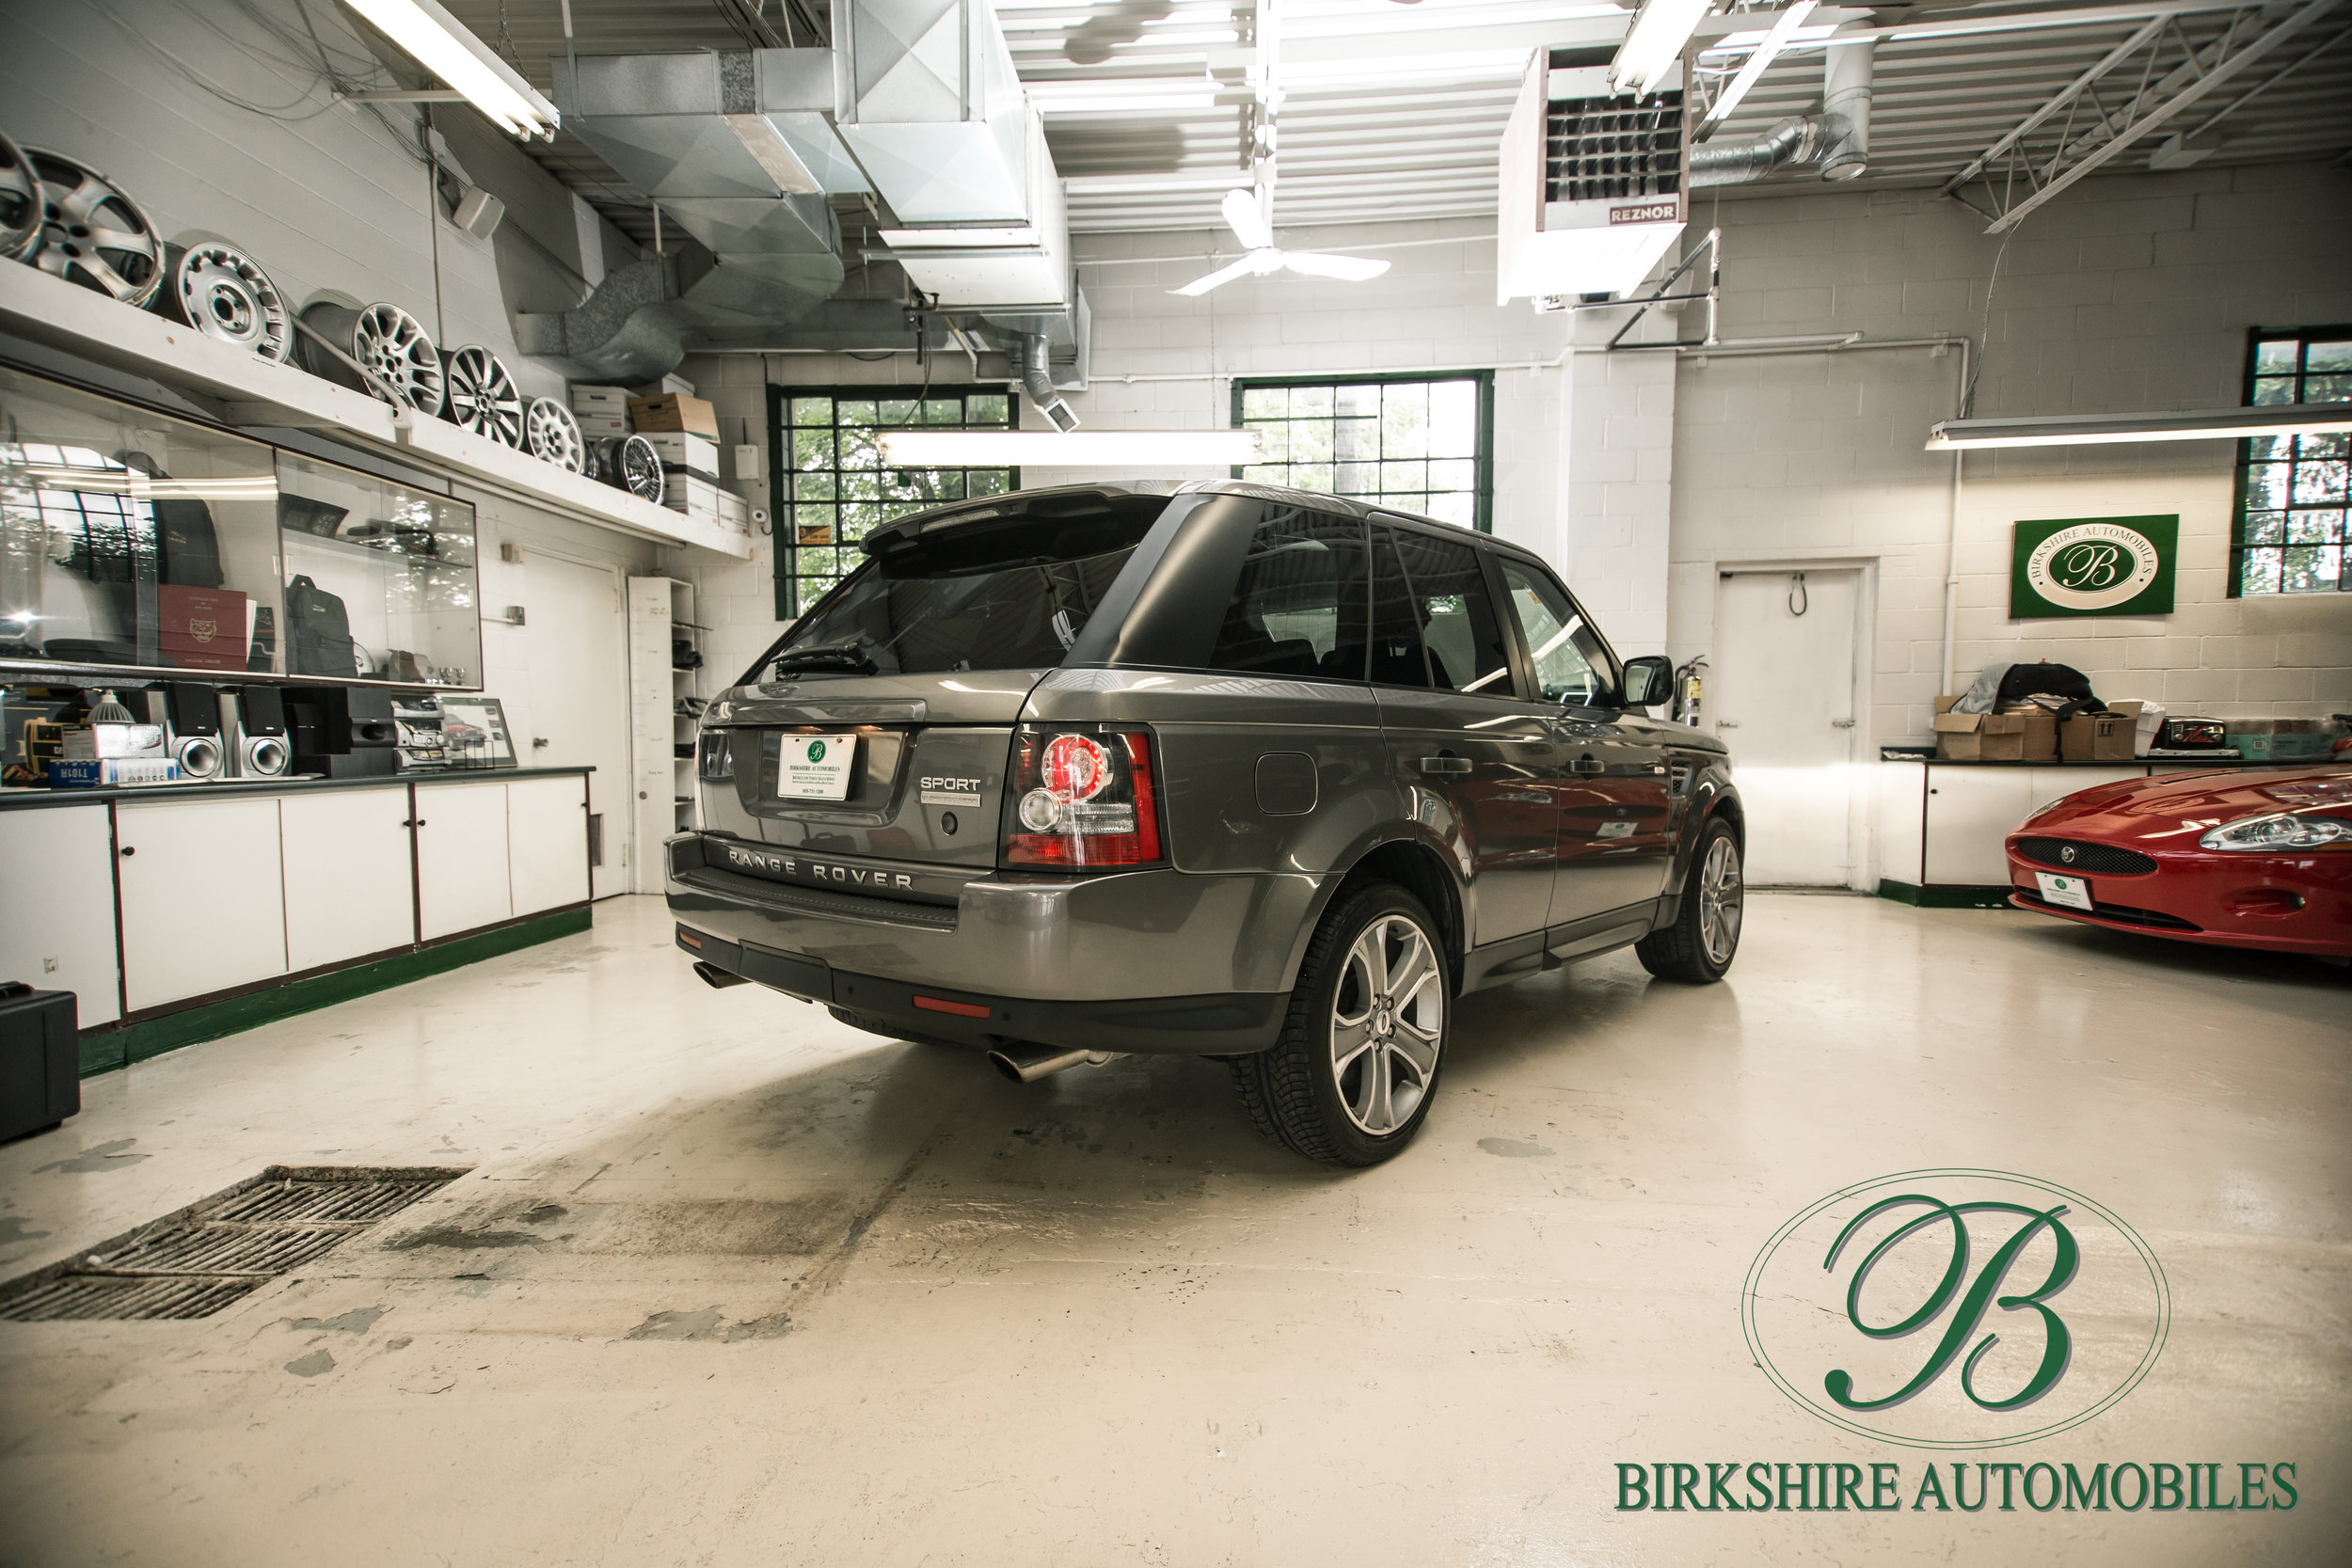 Birkshire Automobiles-23.jpg